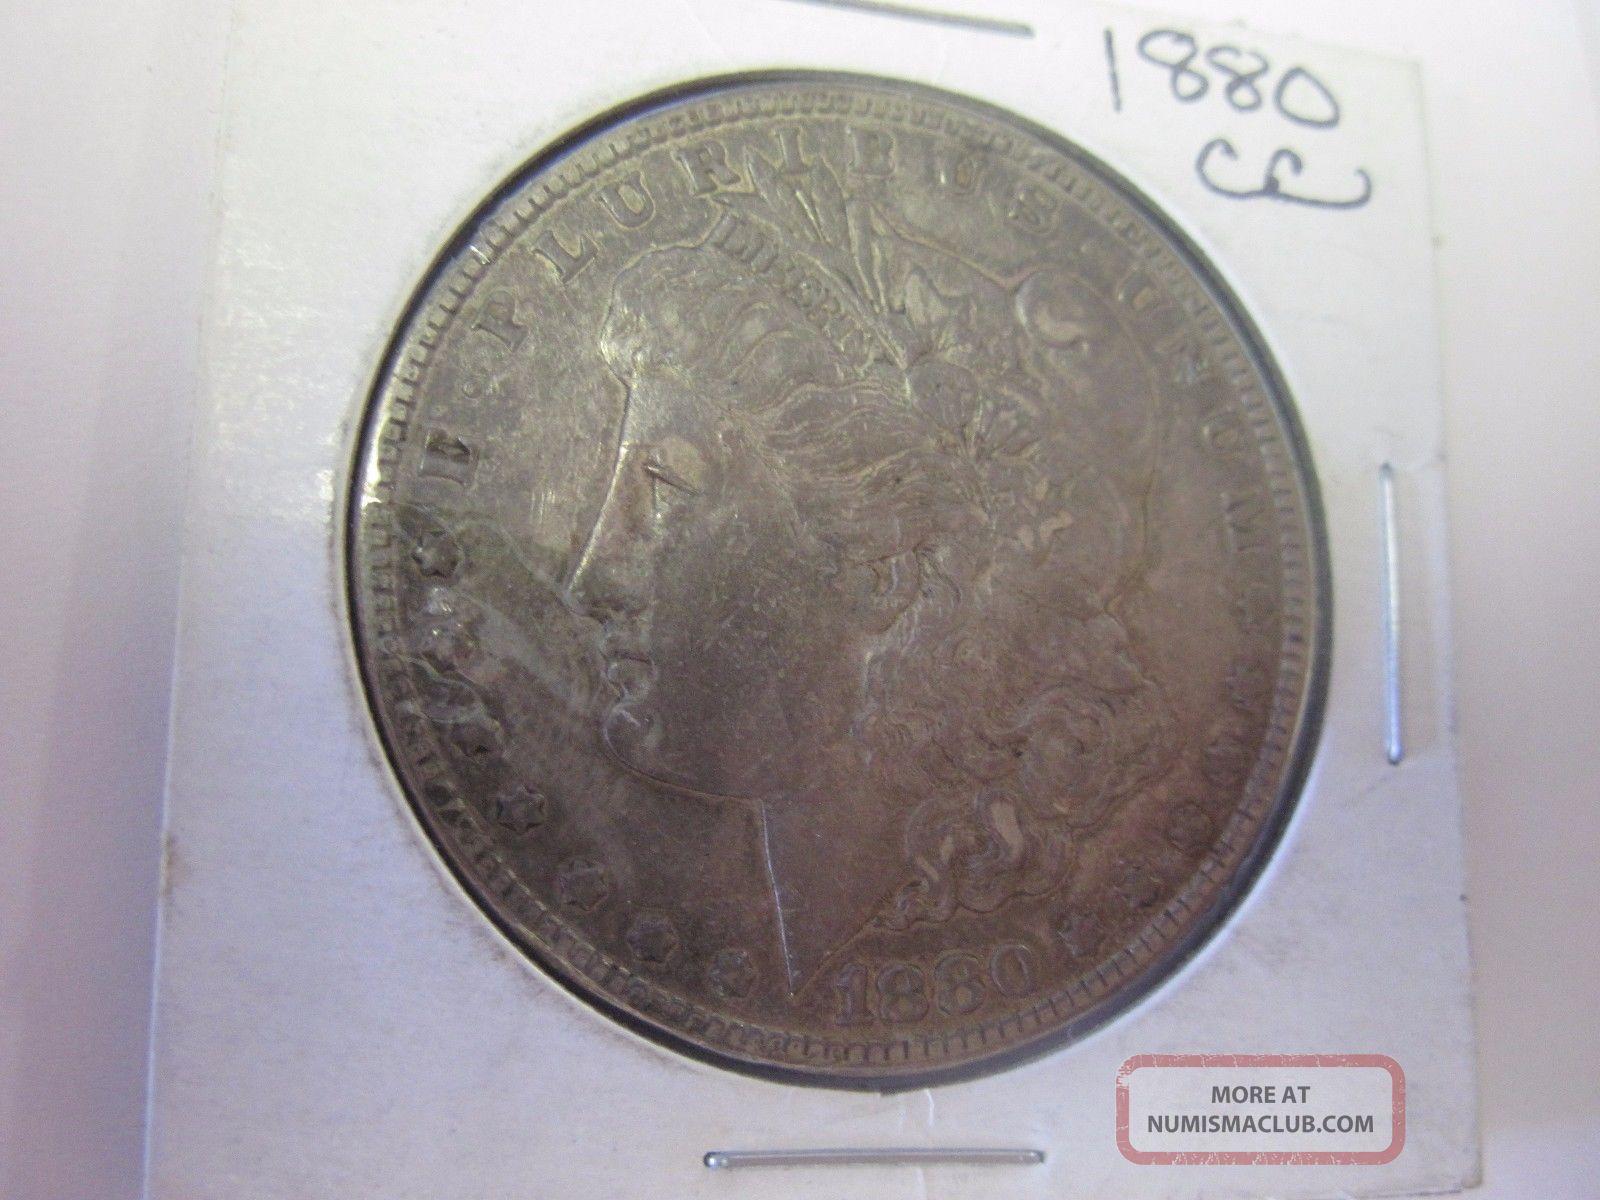 1880 Cc Morgan Silver Dollar Circulated Not Certified Dollars photo